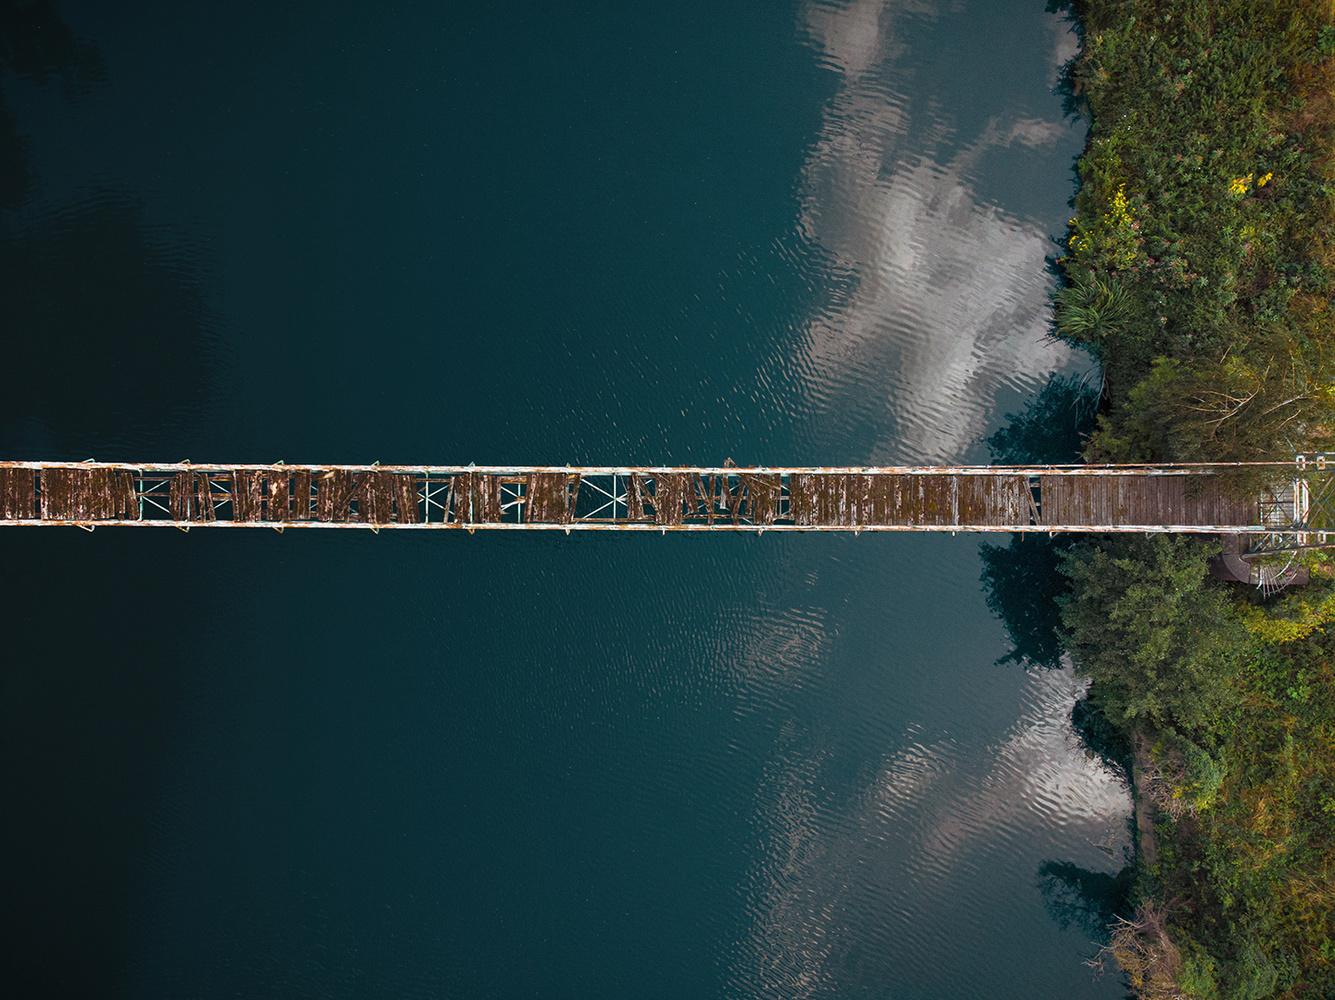 Bridge Top view by Felix Berger